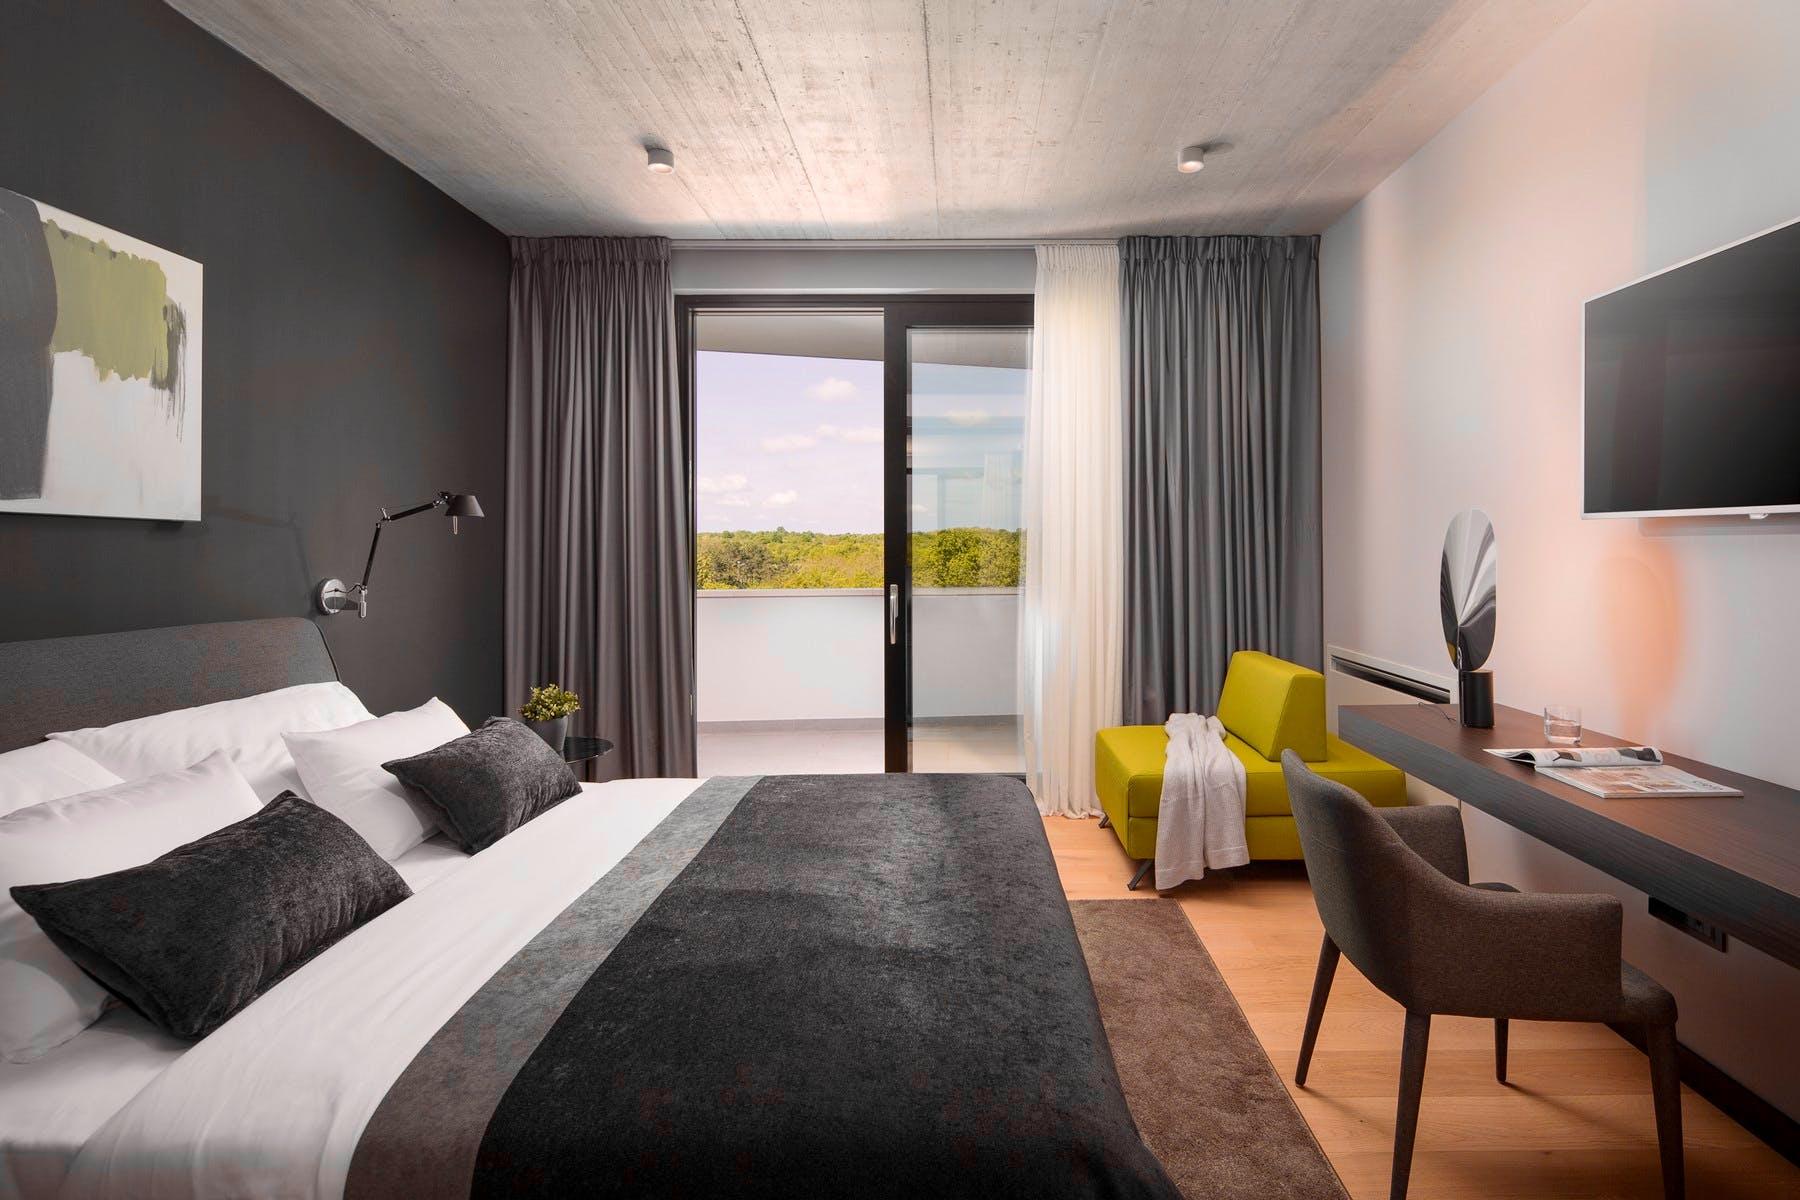 Luxury bedroom with balcony